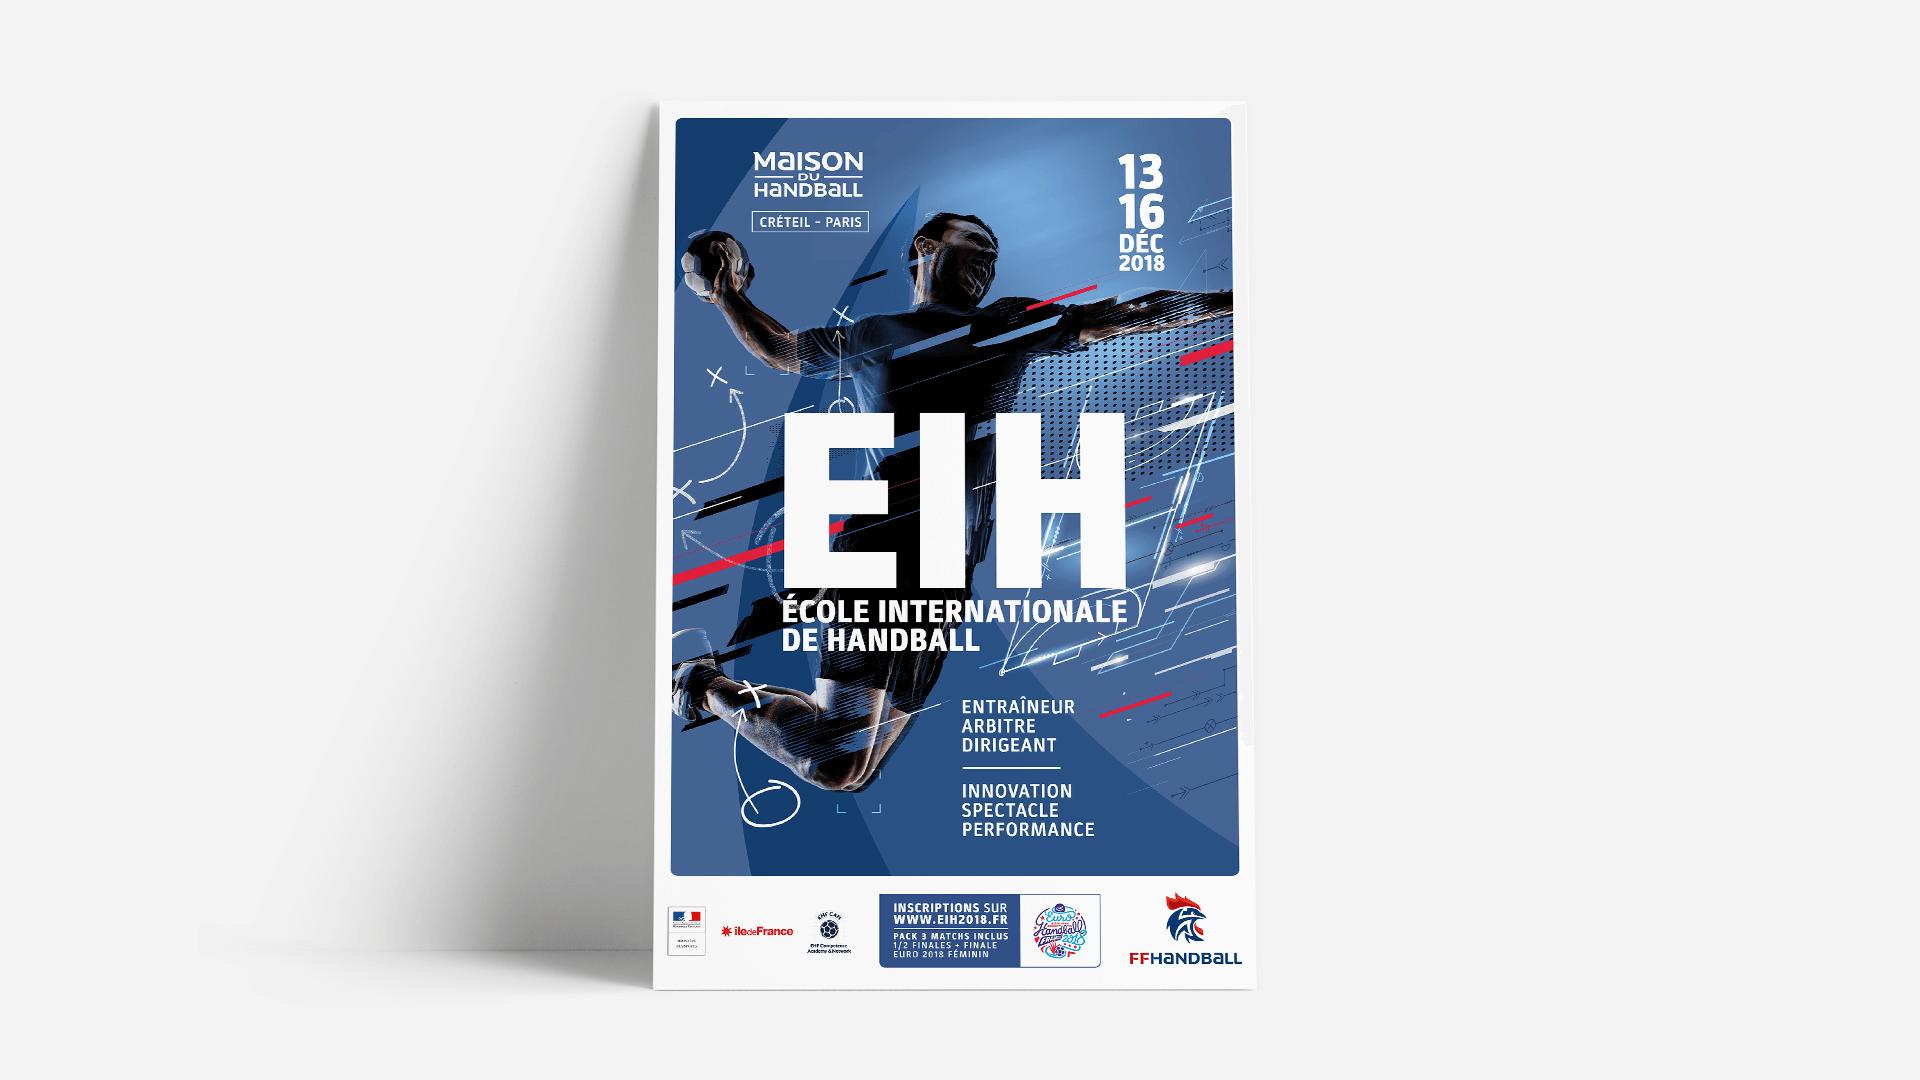 Affiche école Internationale de Handball